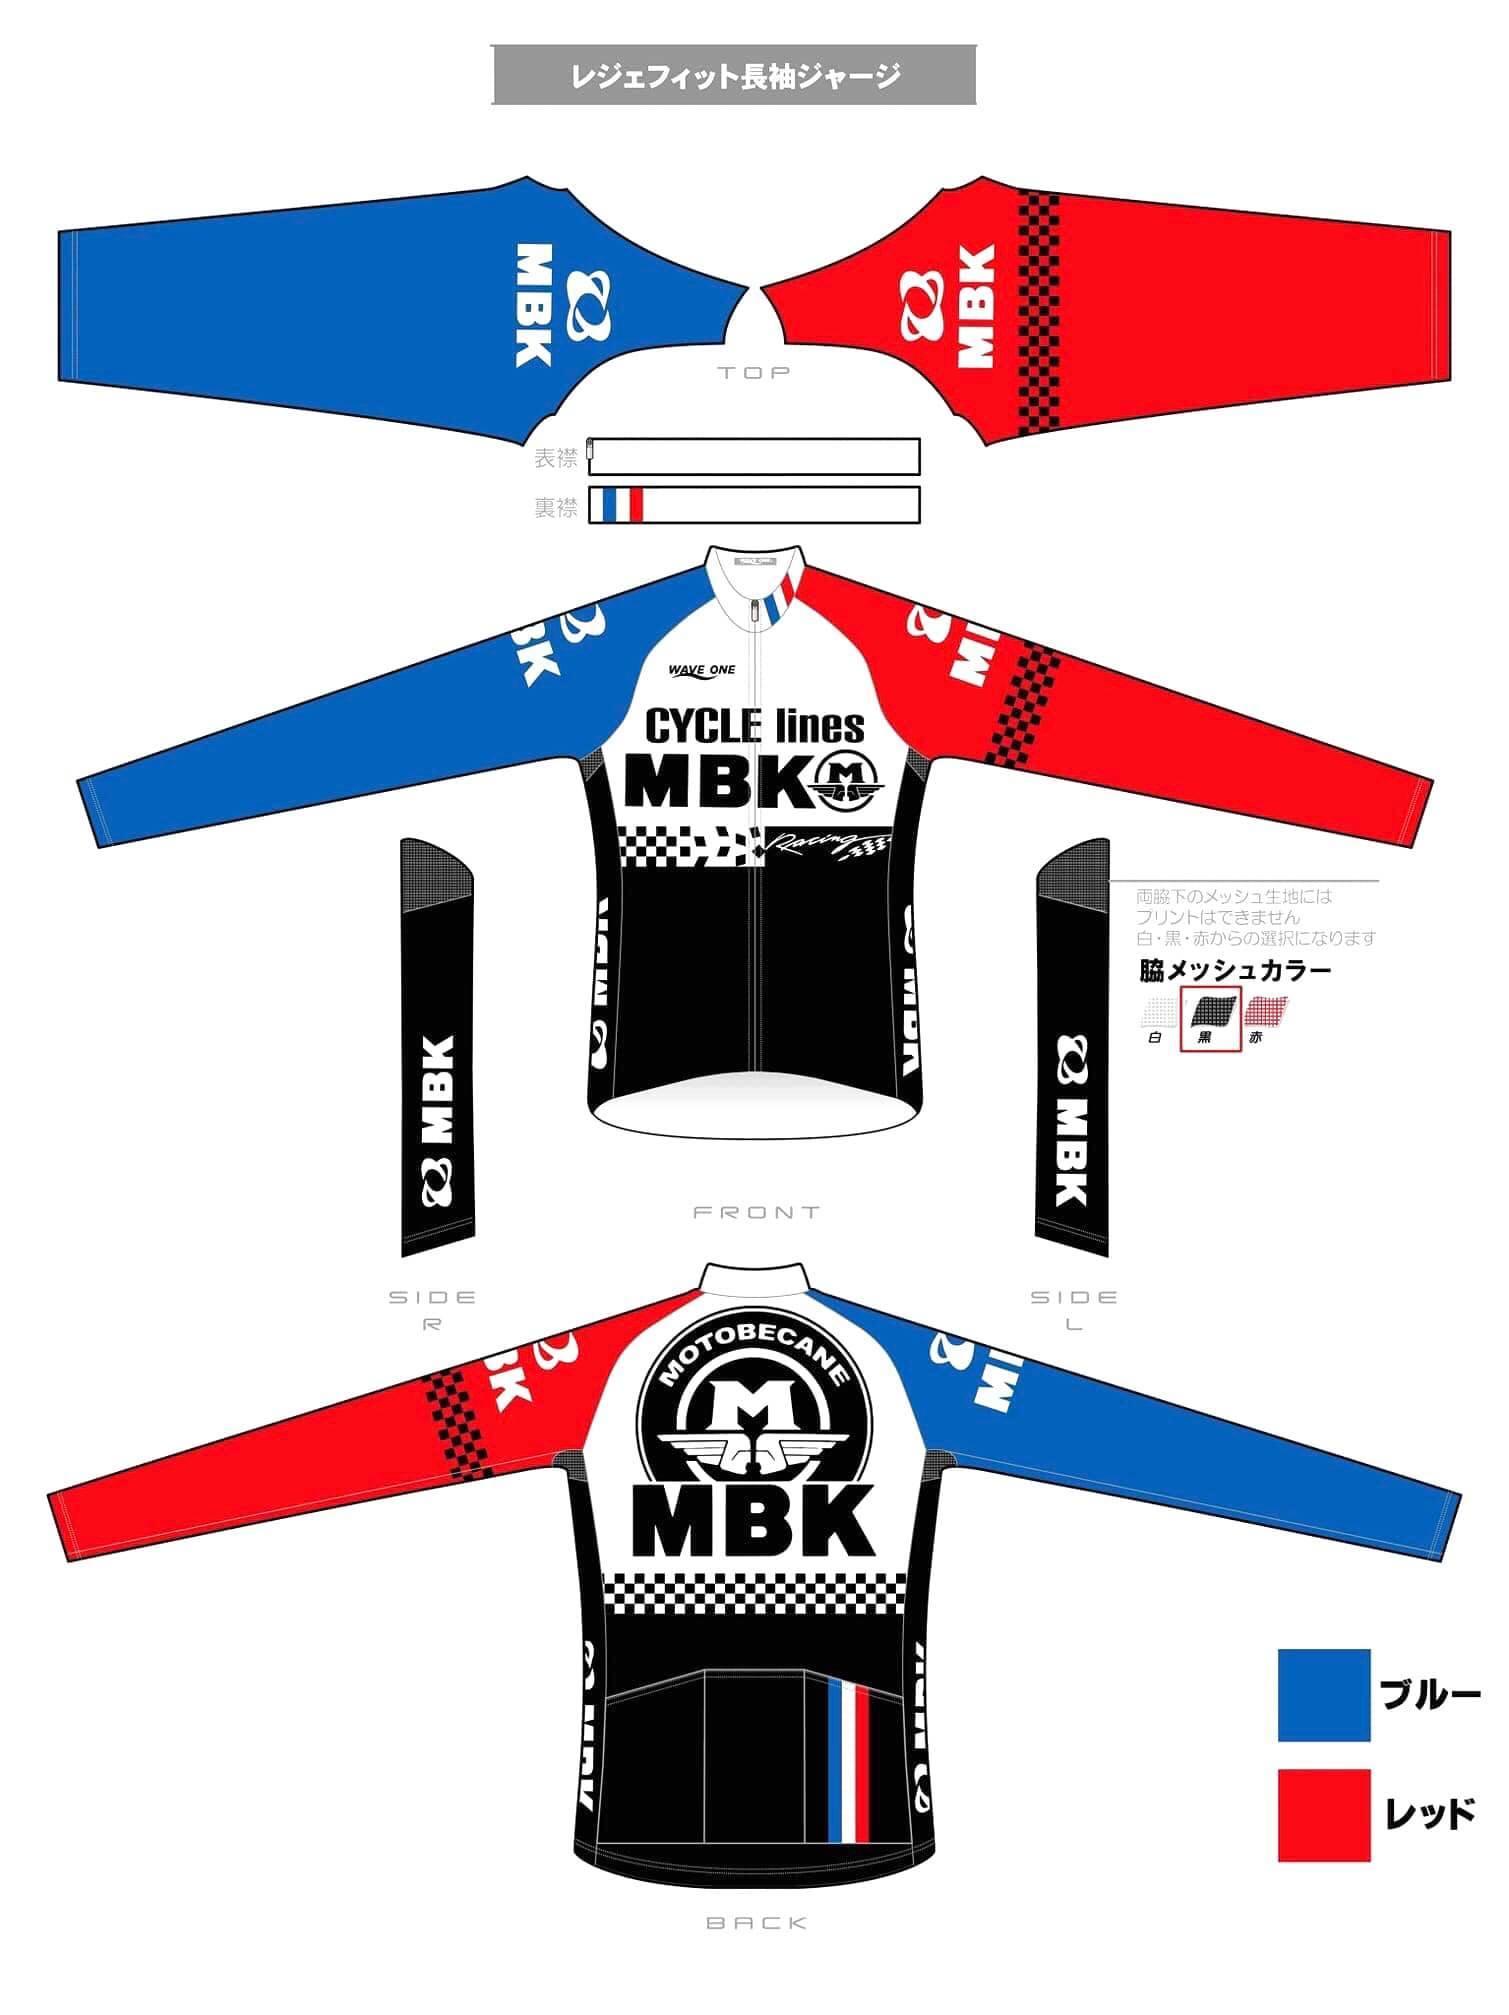 MBKユーザー様へ  MBKオフィシャル公認「夏用-長袖ジャージ」 本日〆切!_b0225442_12521505.jpg